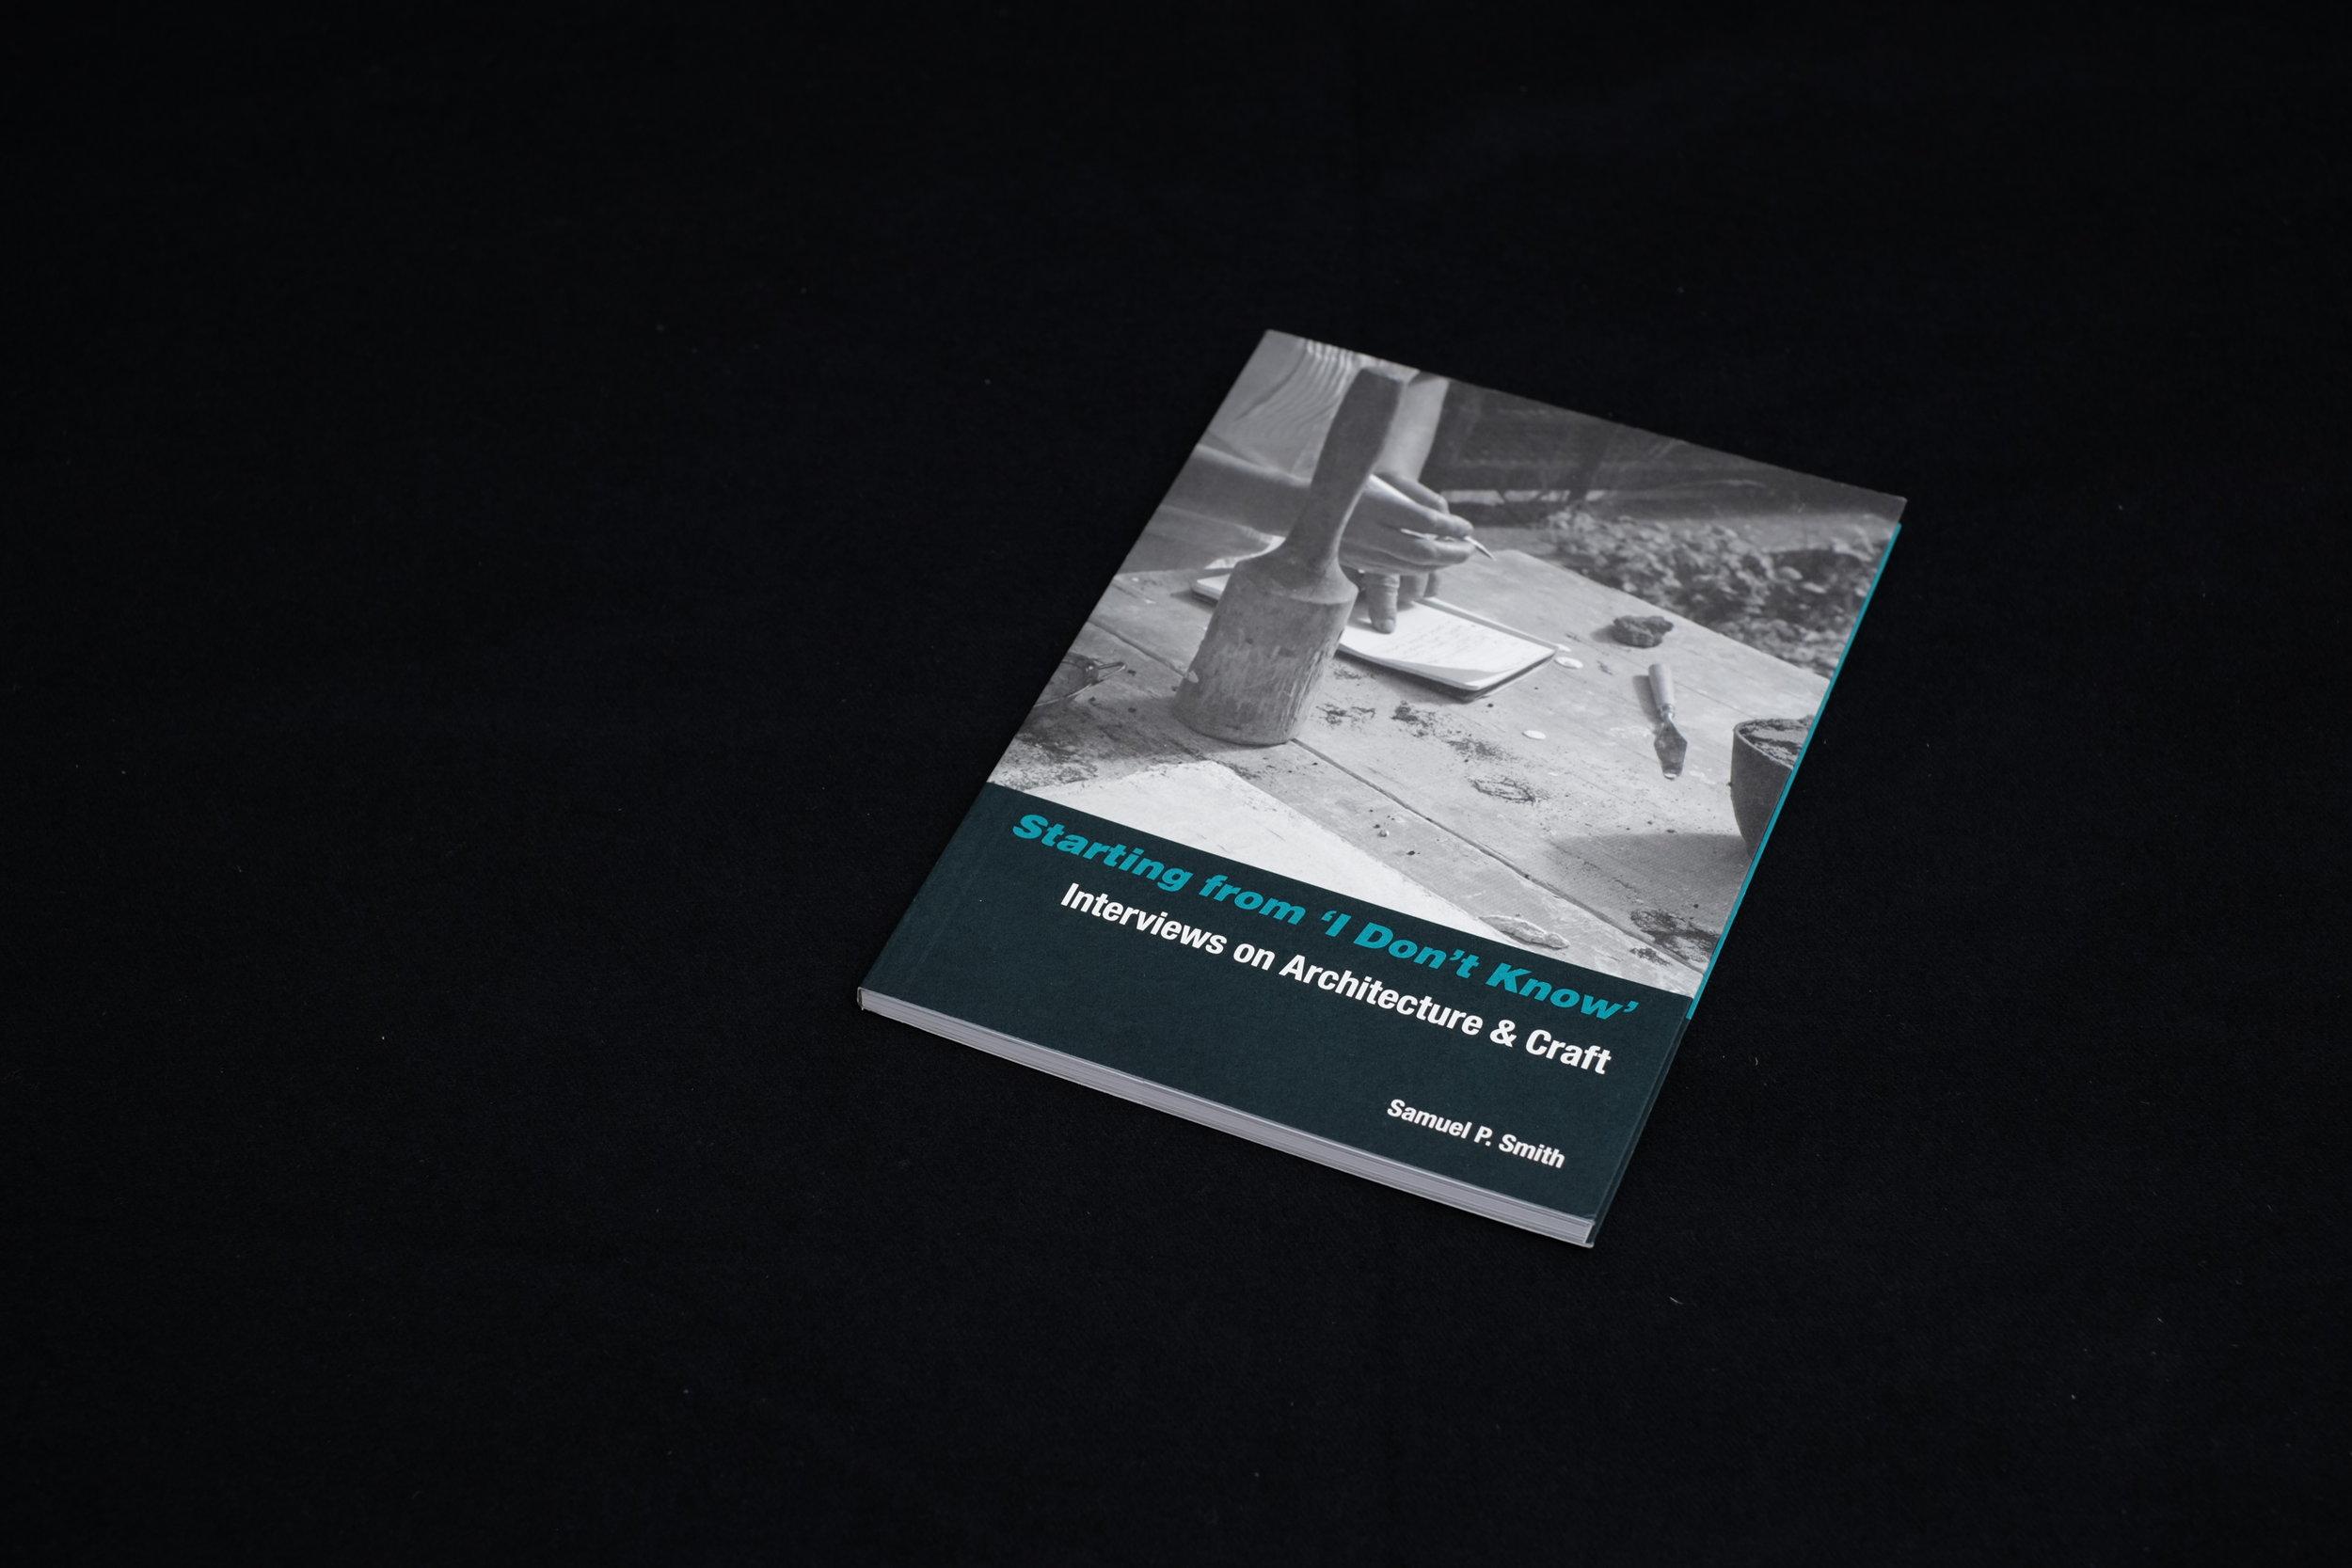 sfidk_180120_18-17-51_0275_cover.jpg